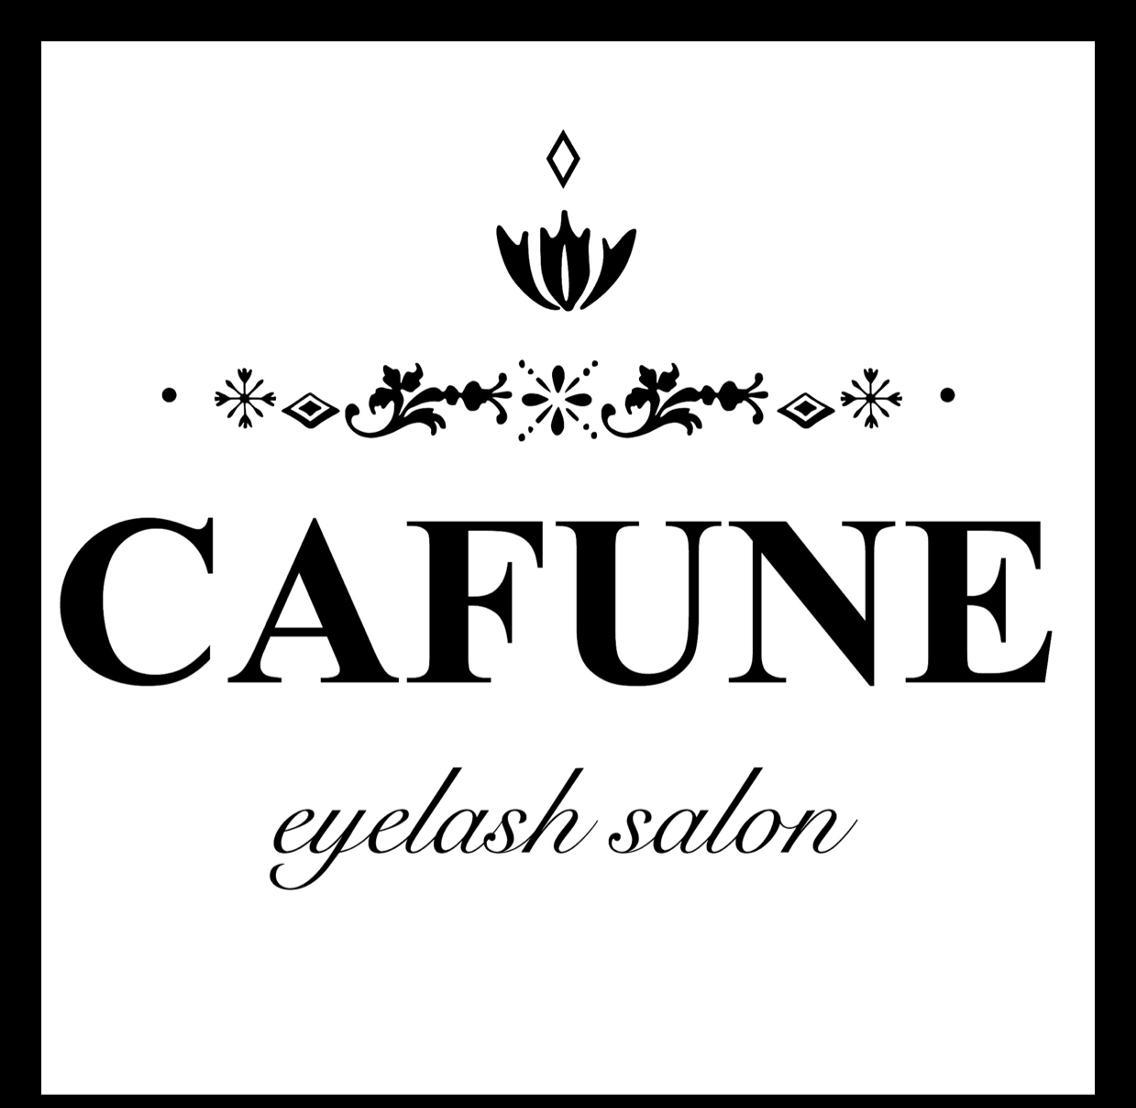 CAFUNE所属・CAFUNE完全付け放題の掲載